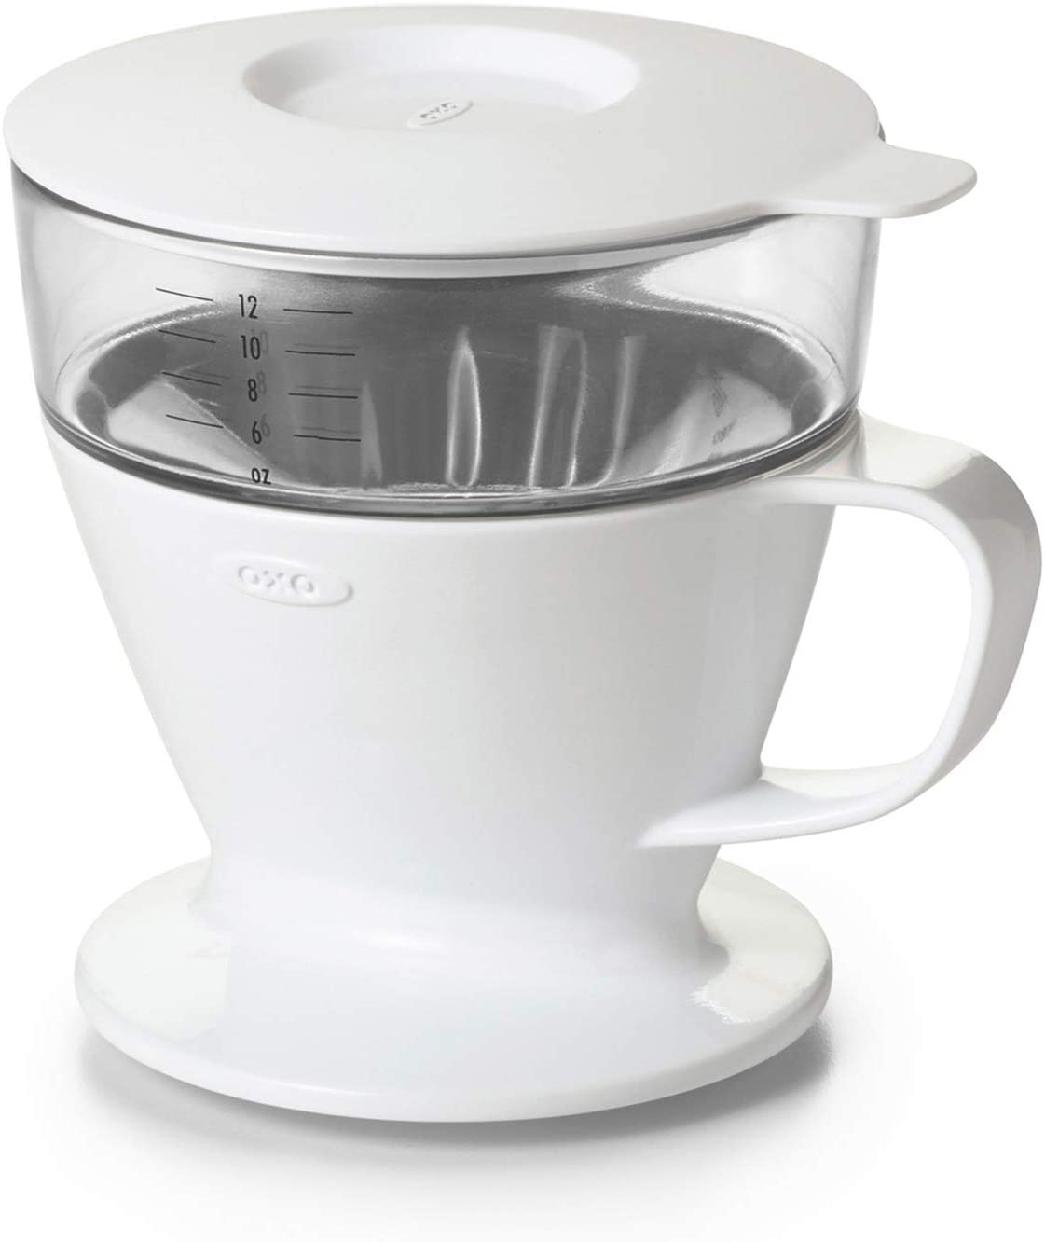 OXO(オクソー) オートドリップコーヒーメーカー 11180100の商品画像